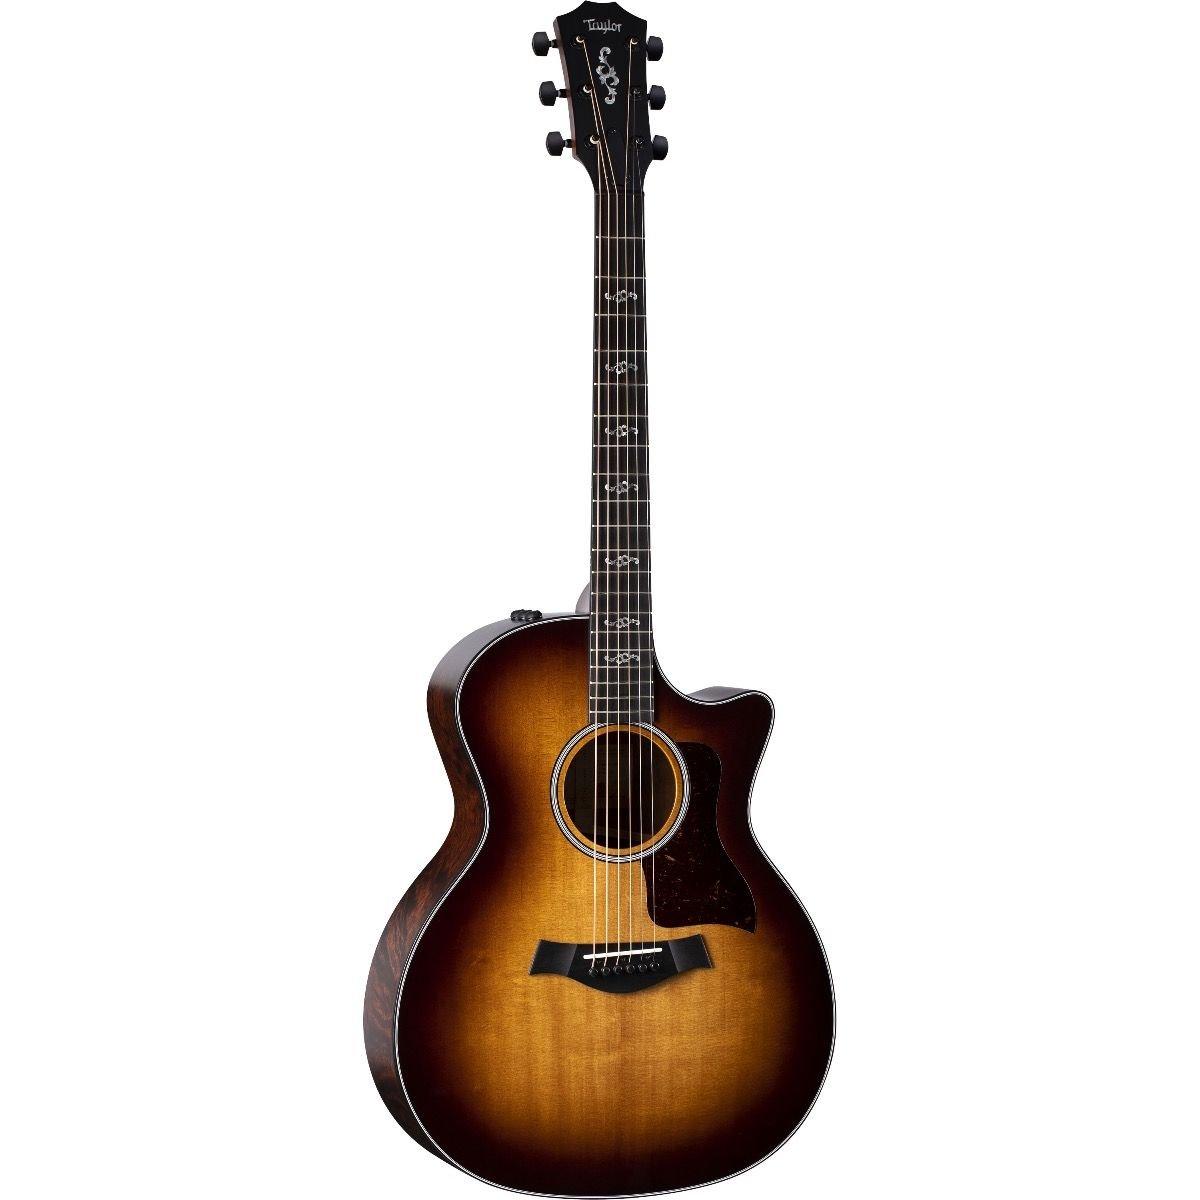 Taylor 314ce LTD Grand Auditorium A/E Guitar Quilted Sapele with Case